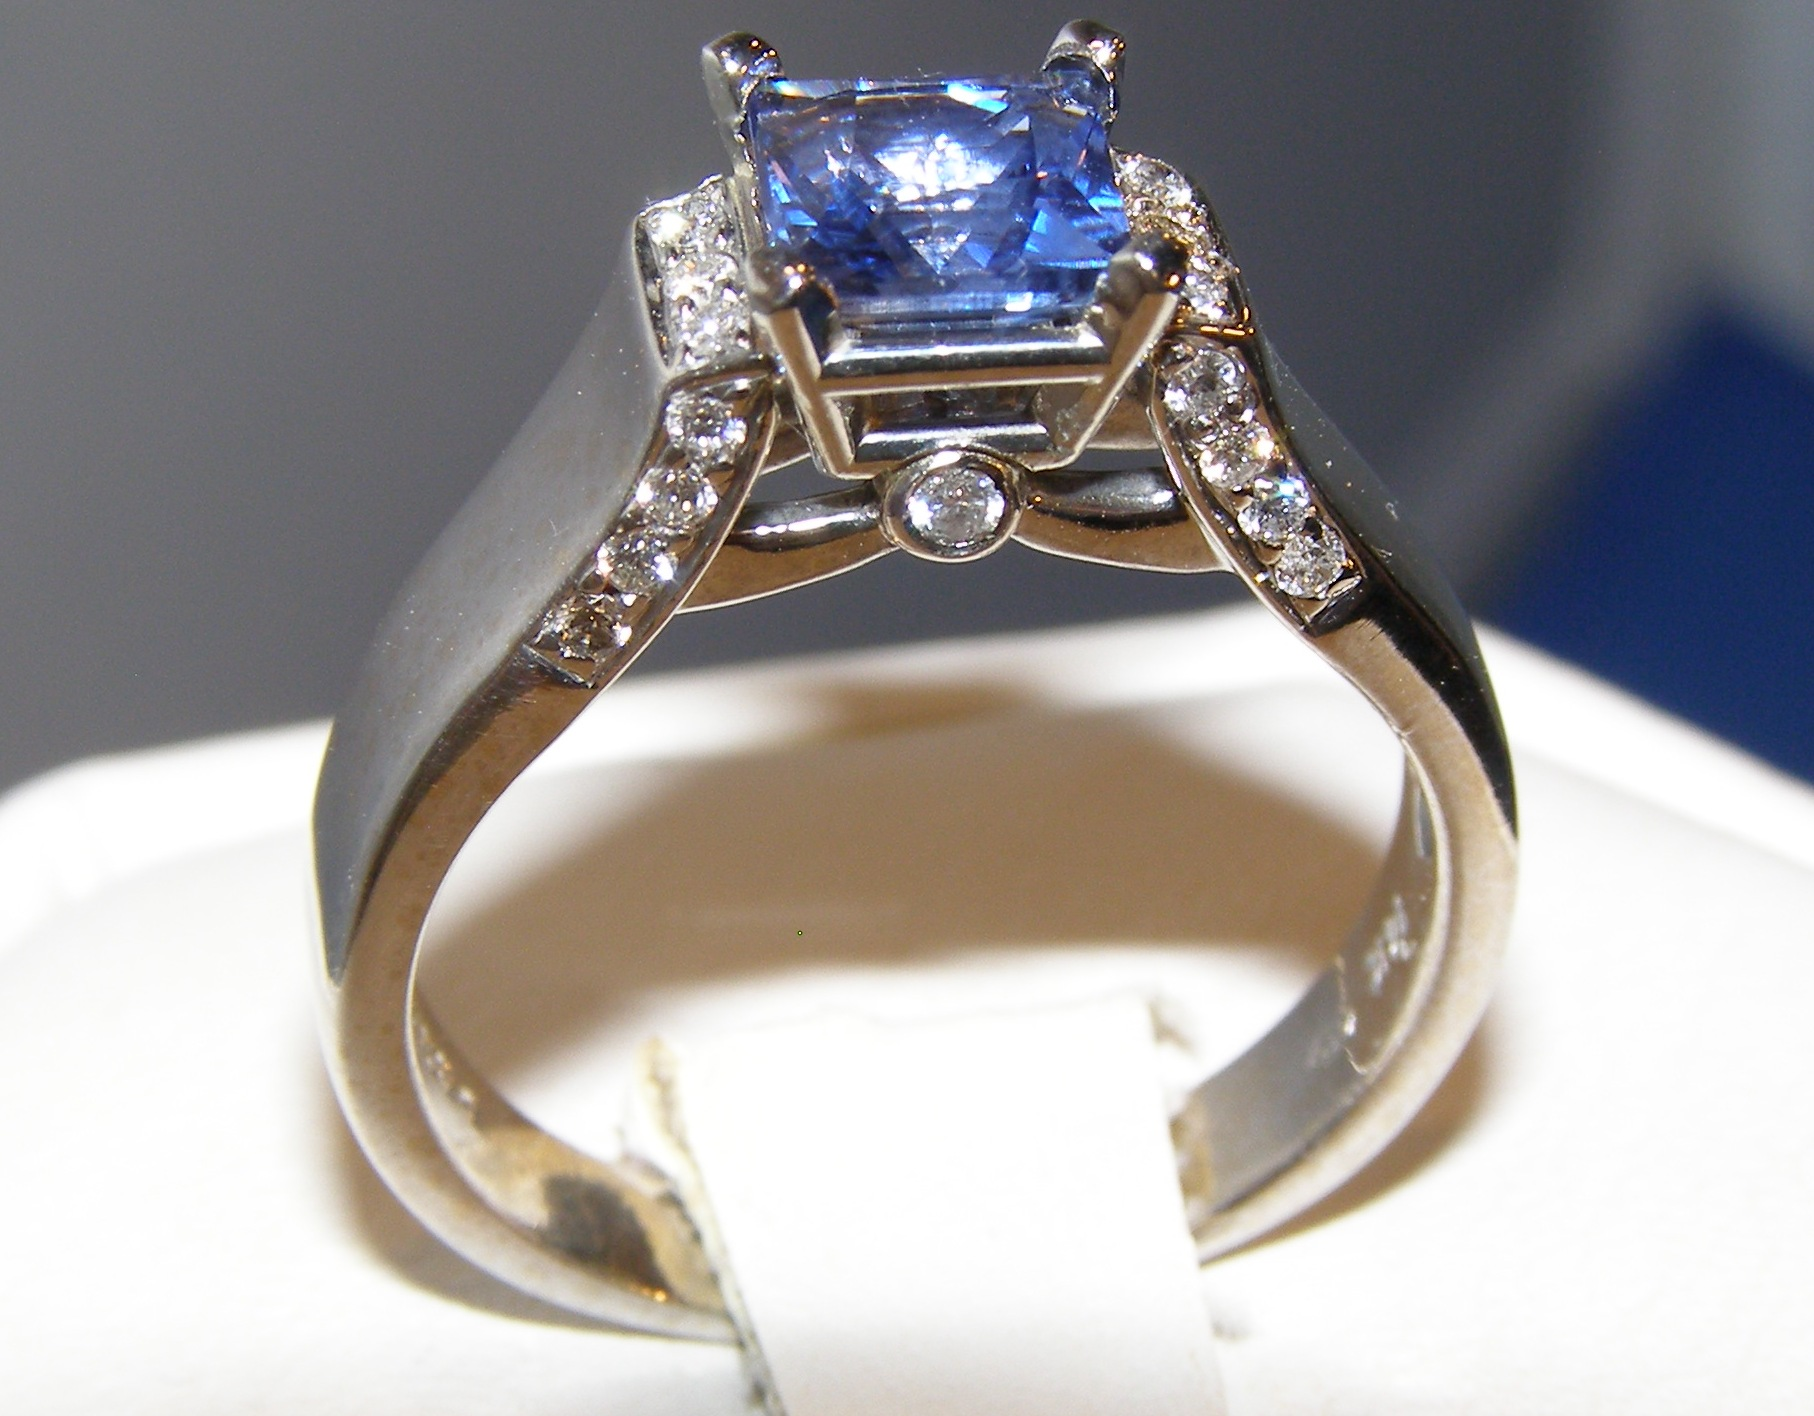 Rare Princess Cut Sapphire Diamond Ring 14KWG 1.29 ctw